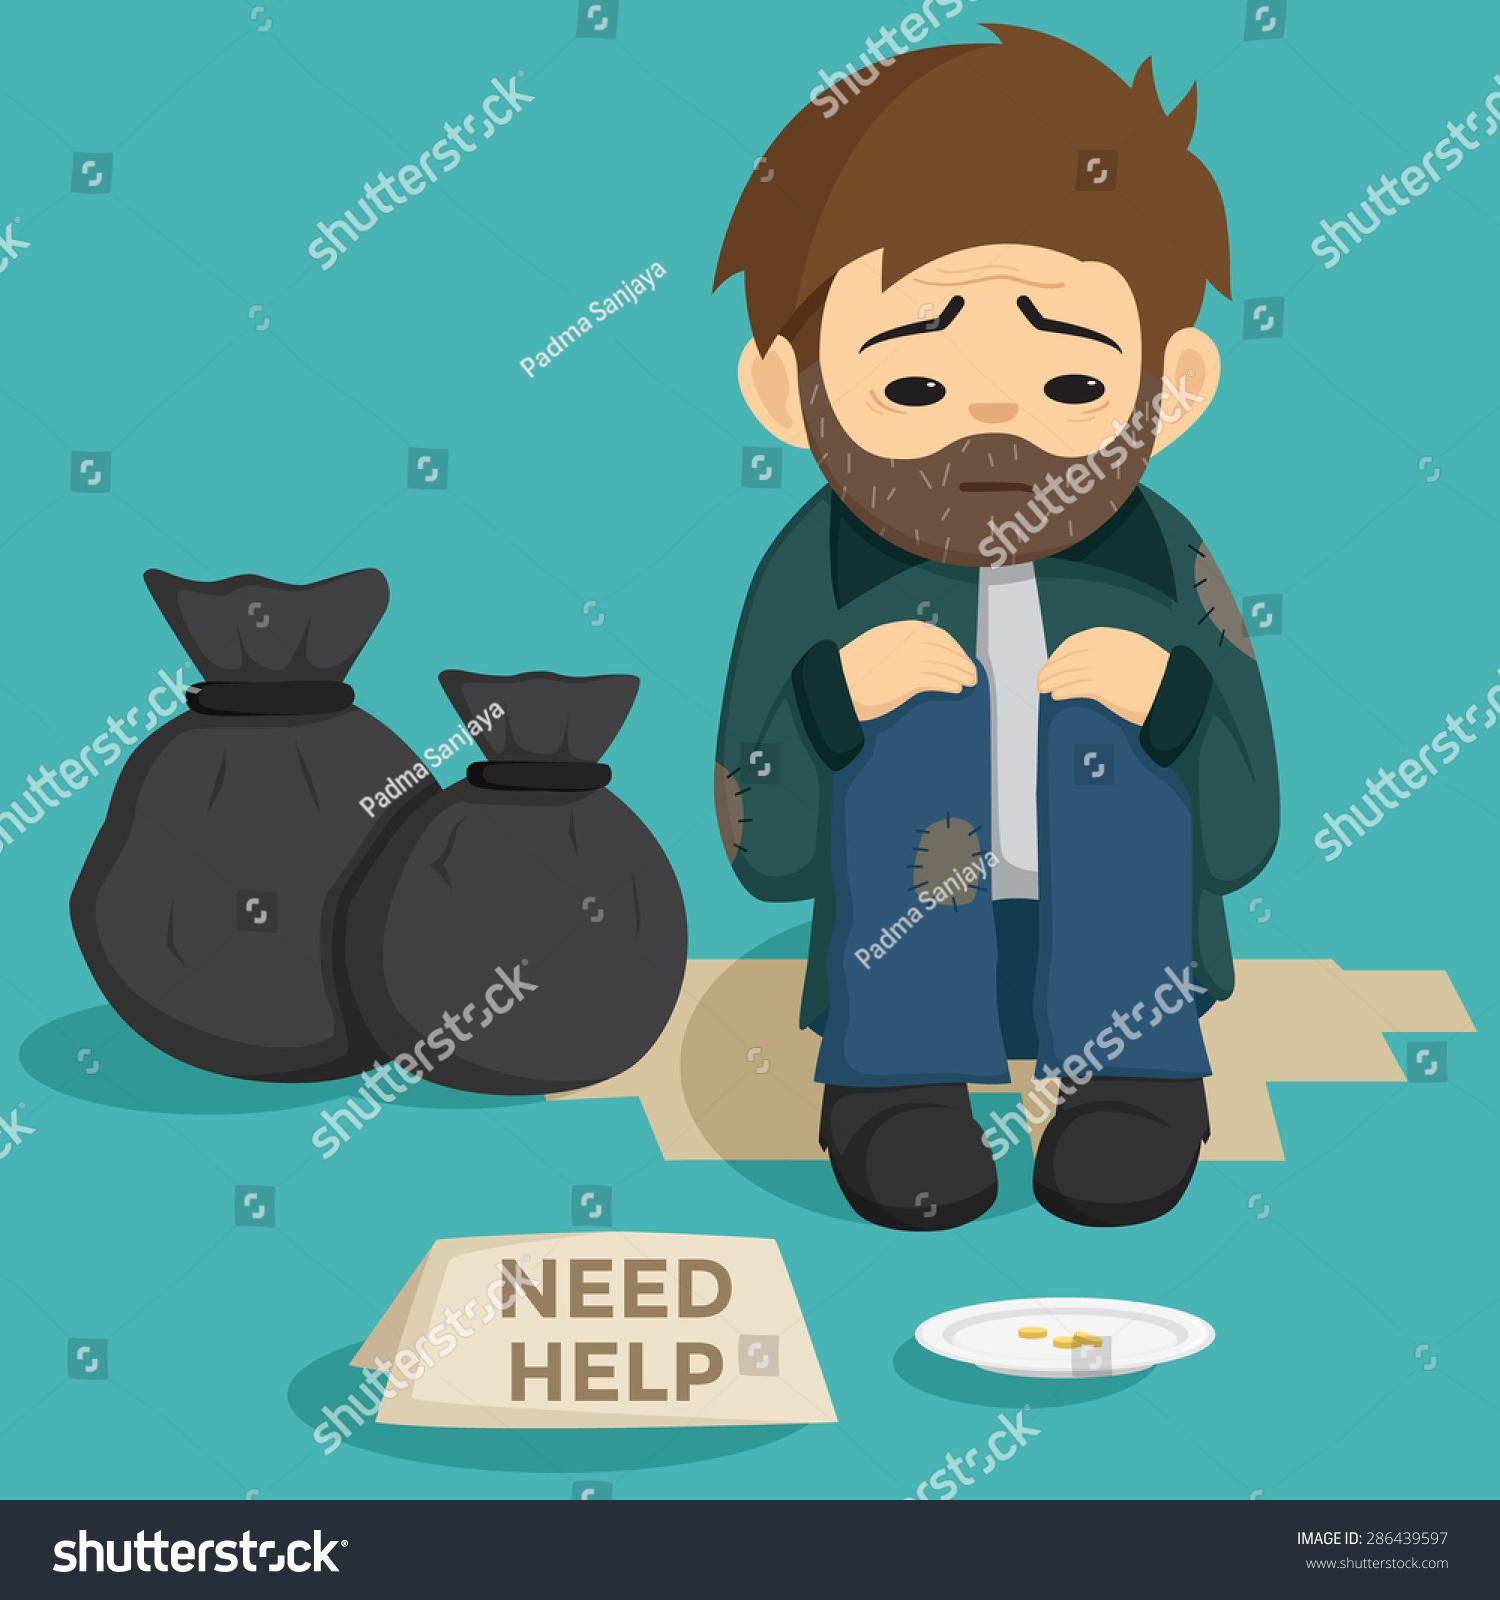 Help wiyh paper